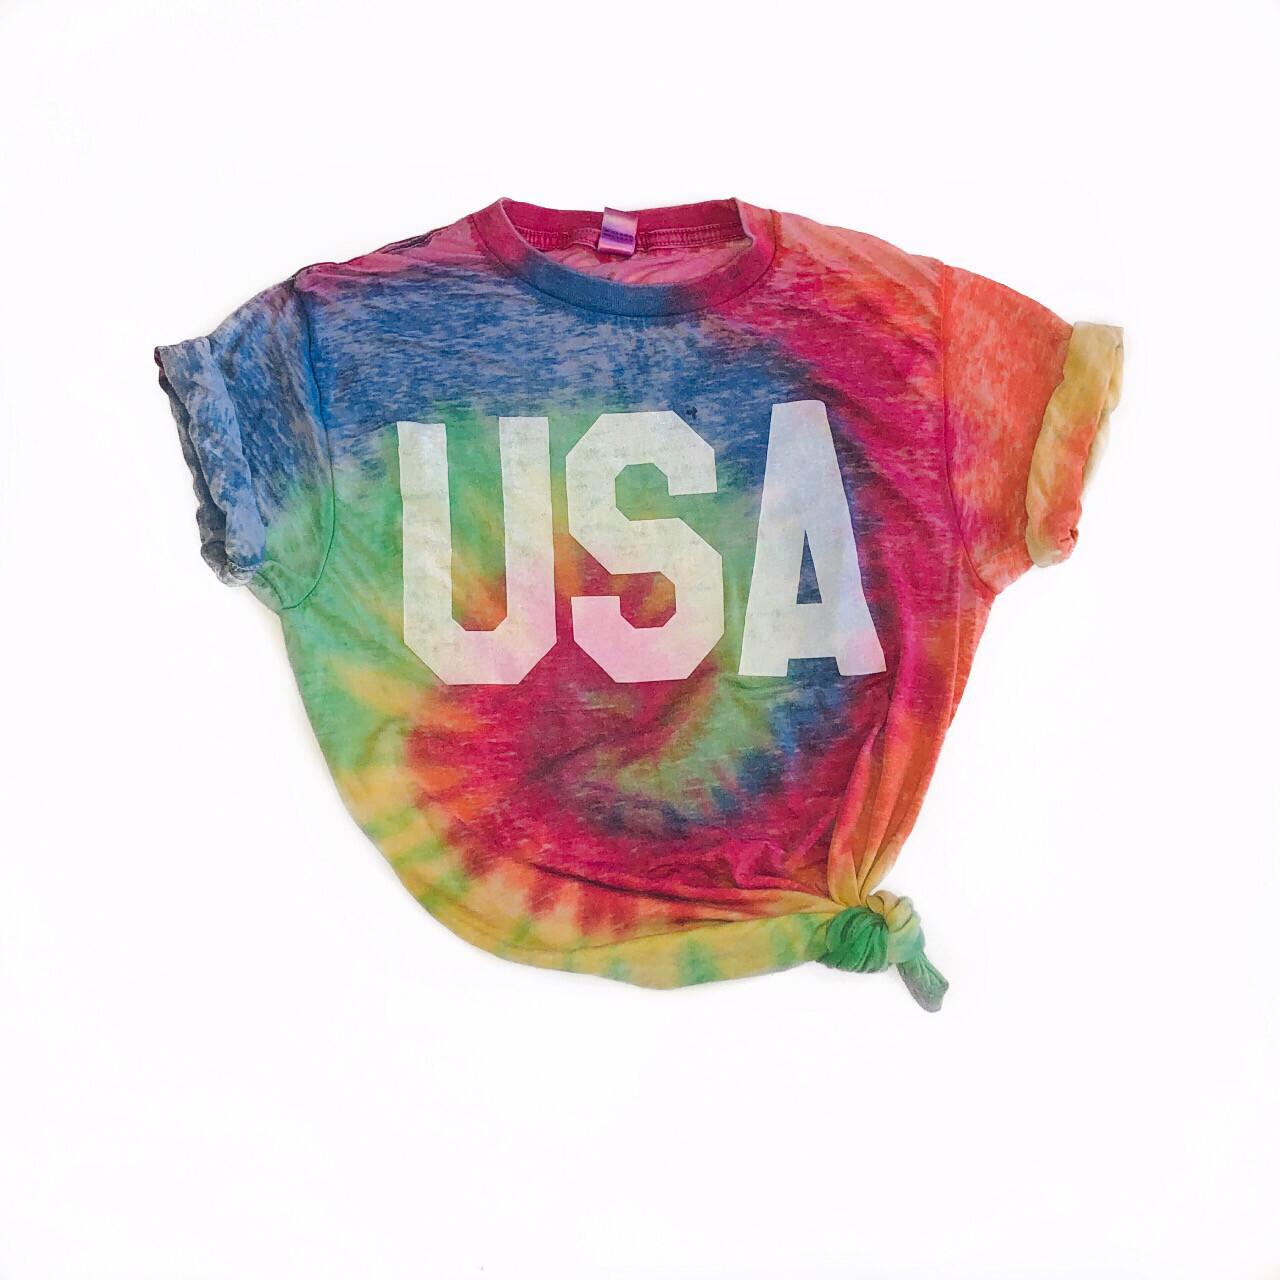 Vintage USA Tie Dye Tee 40% OFF